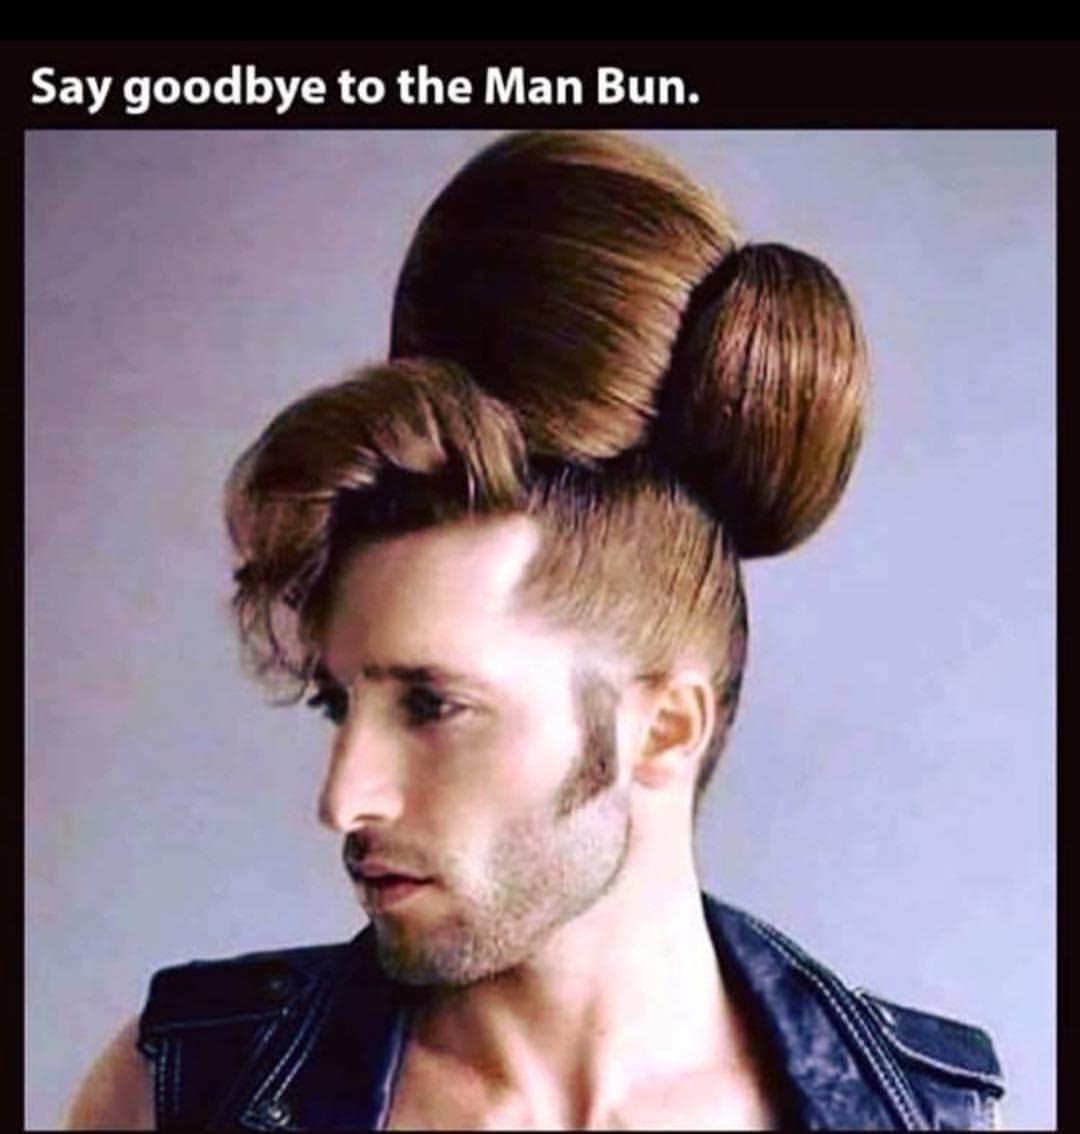 Say Goodbye To The Man Bun Meme Ahseeit